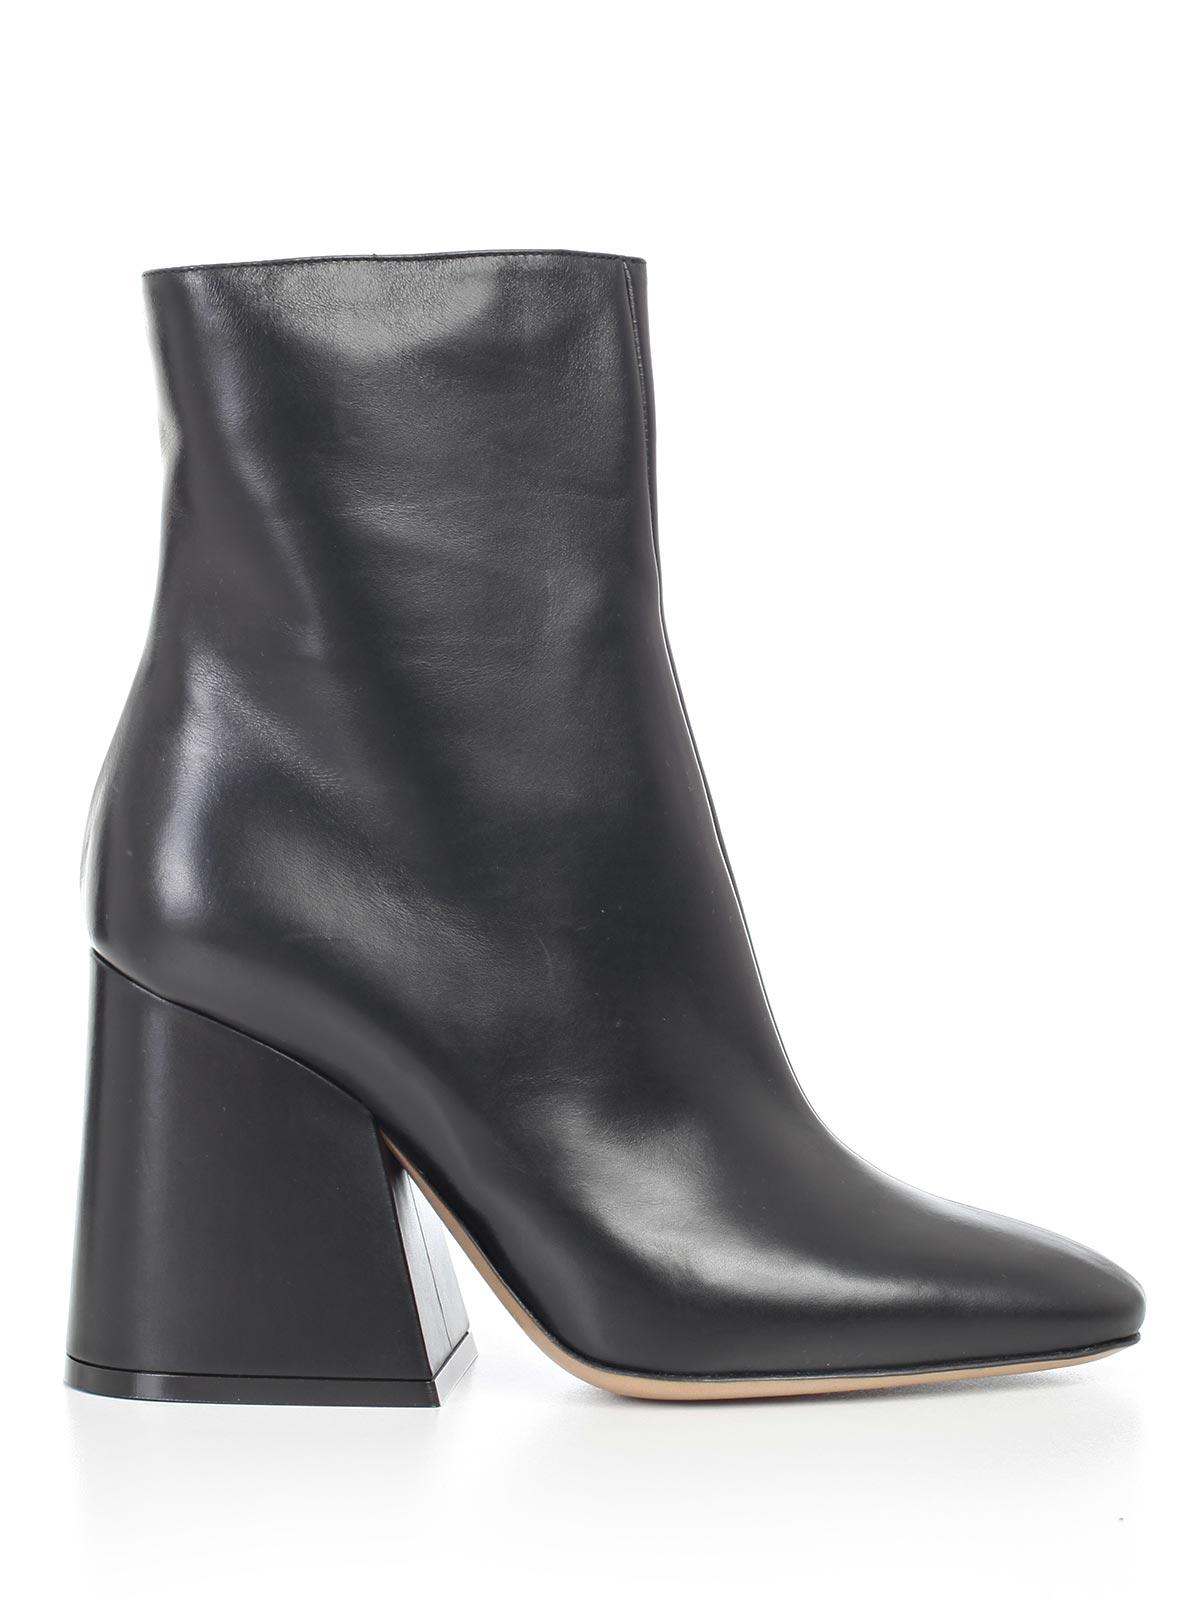 Picture of MAISON MARGIELA Boots